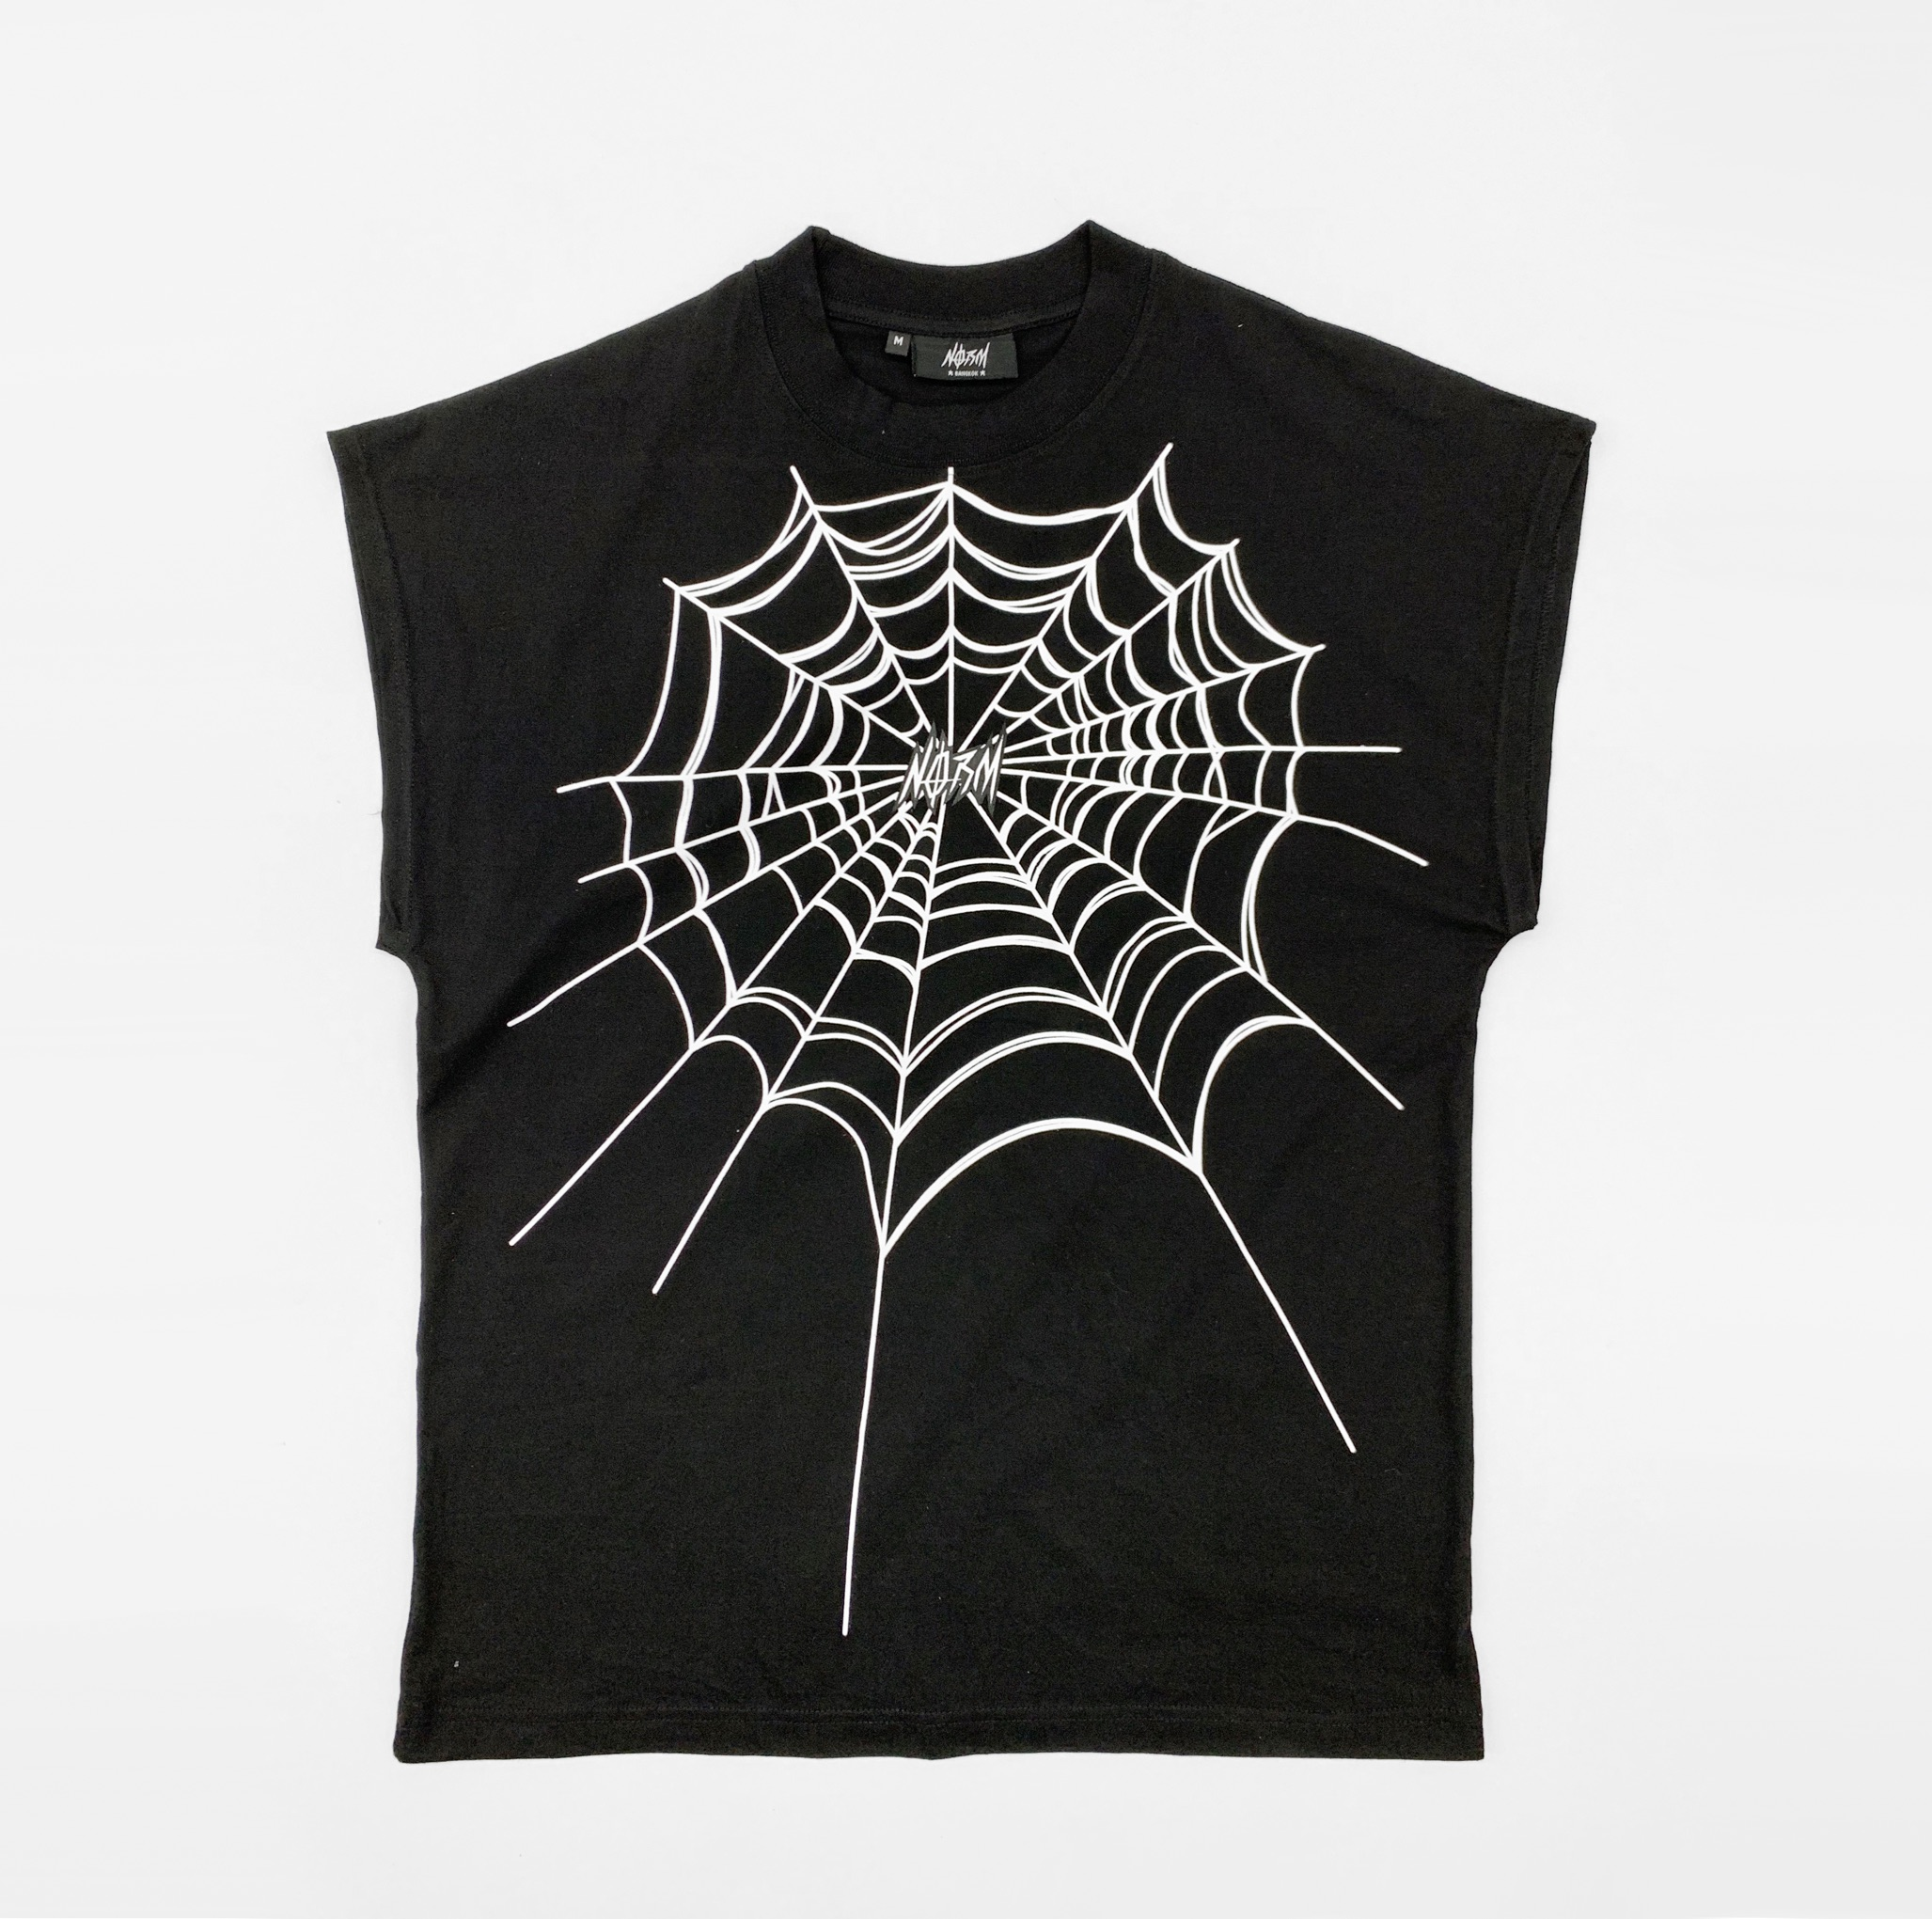 NORM SPIDER WEB